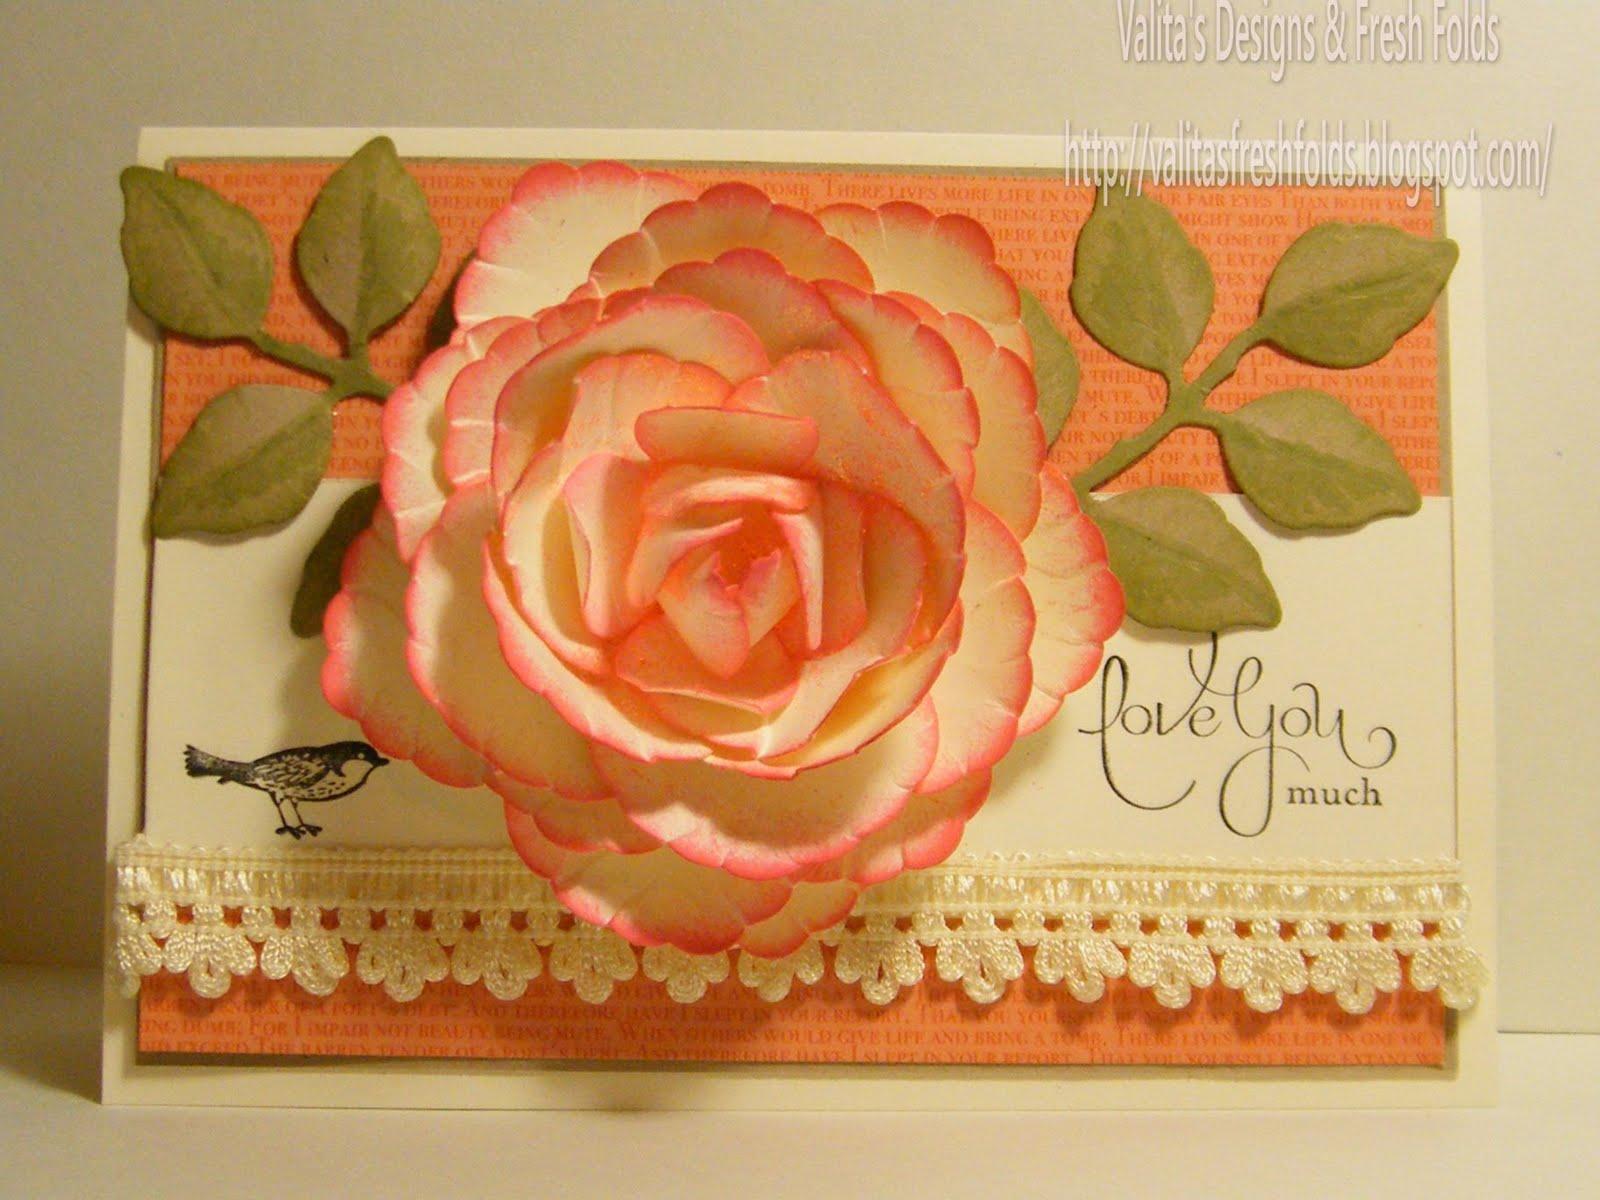 Valitas designs fresh folds making paper art peony flowers making paper art peony flowers mightylinksfo